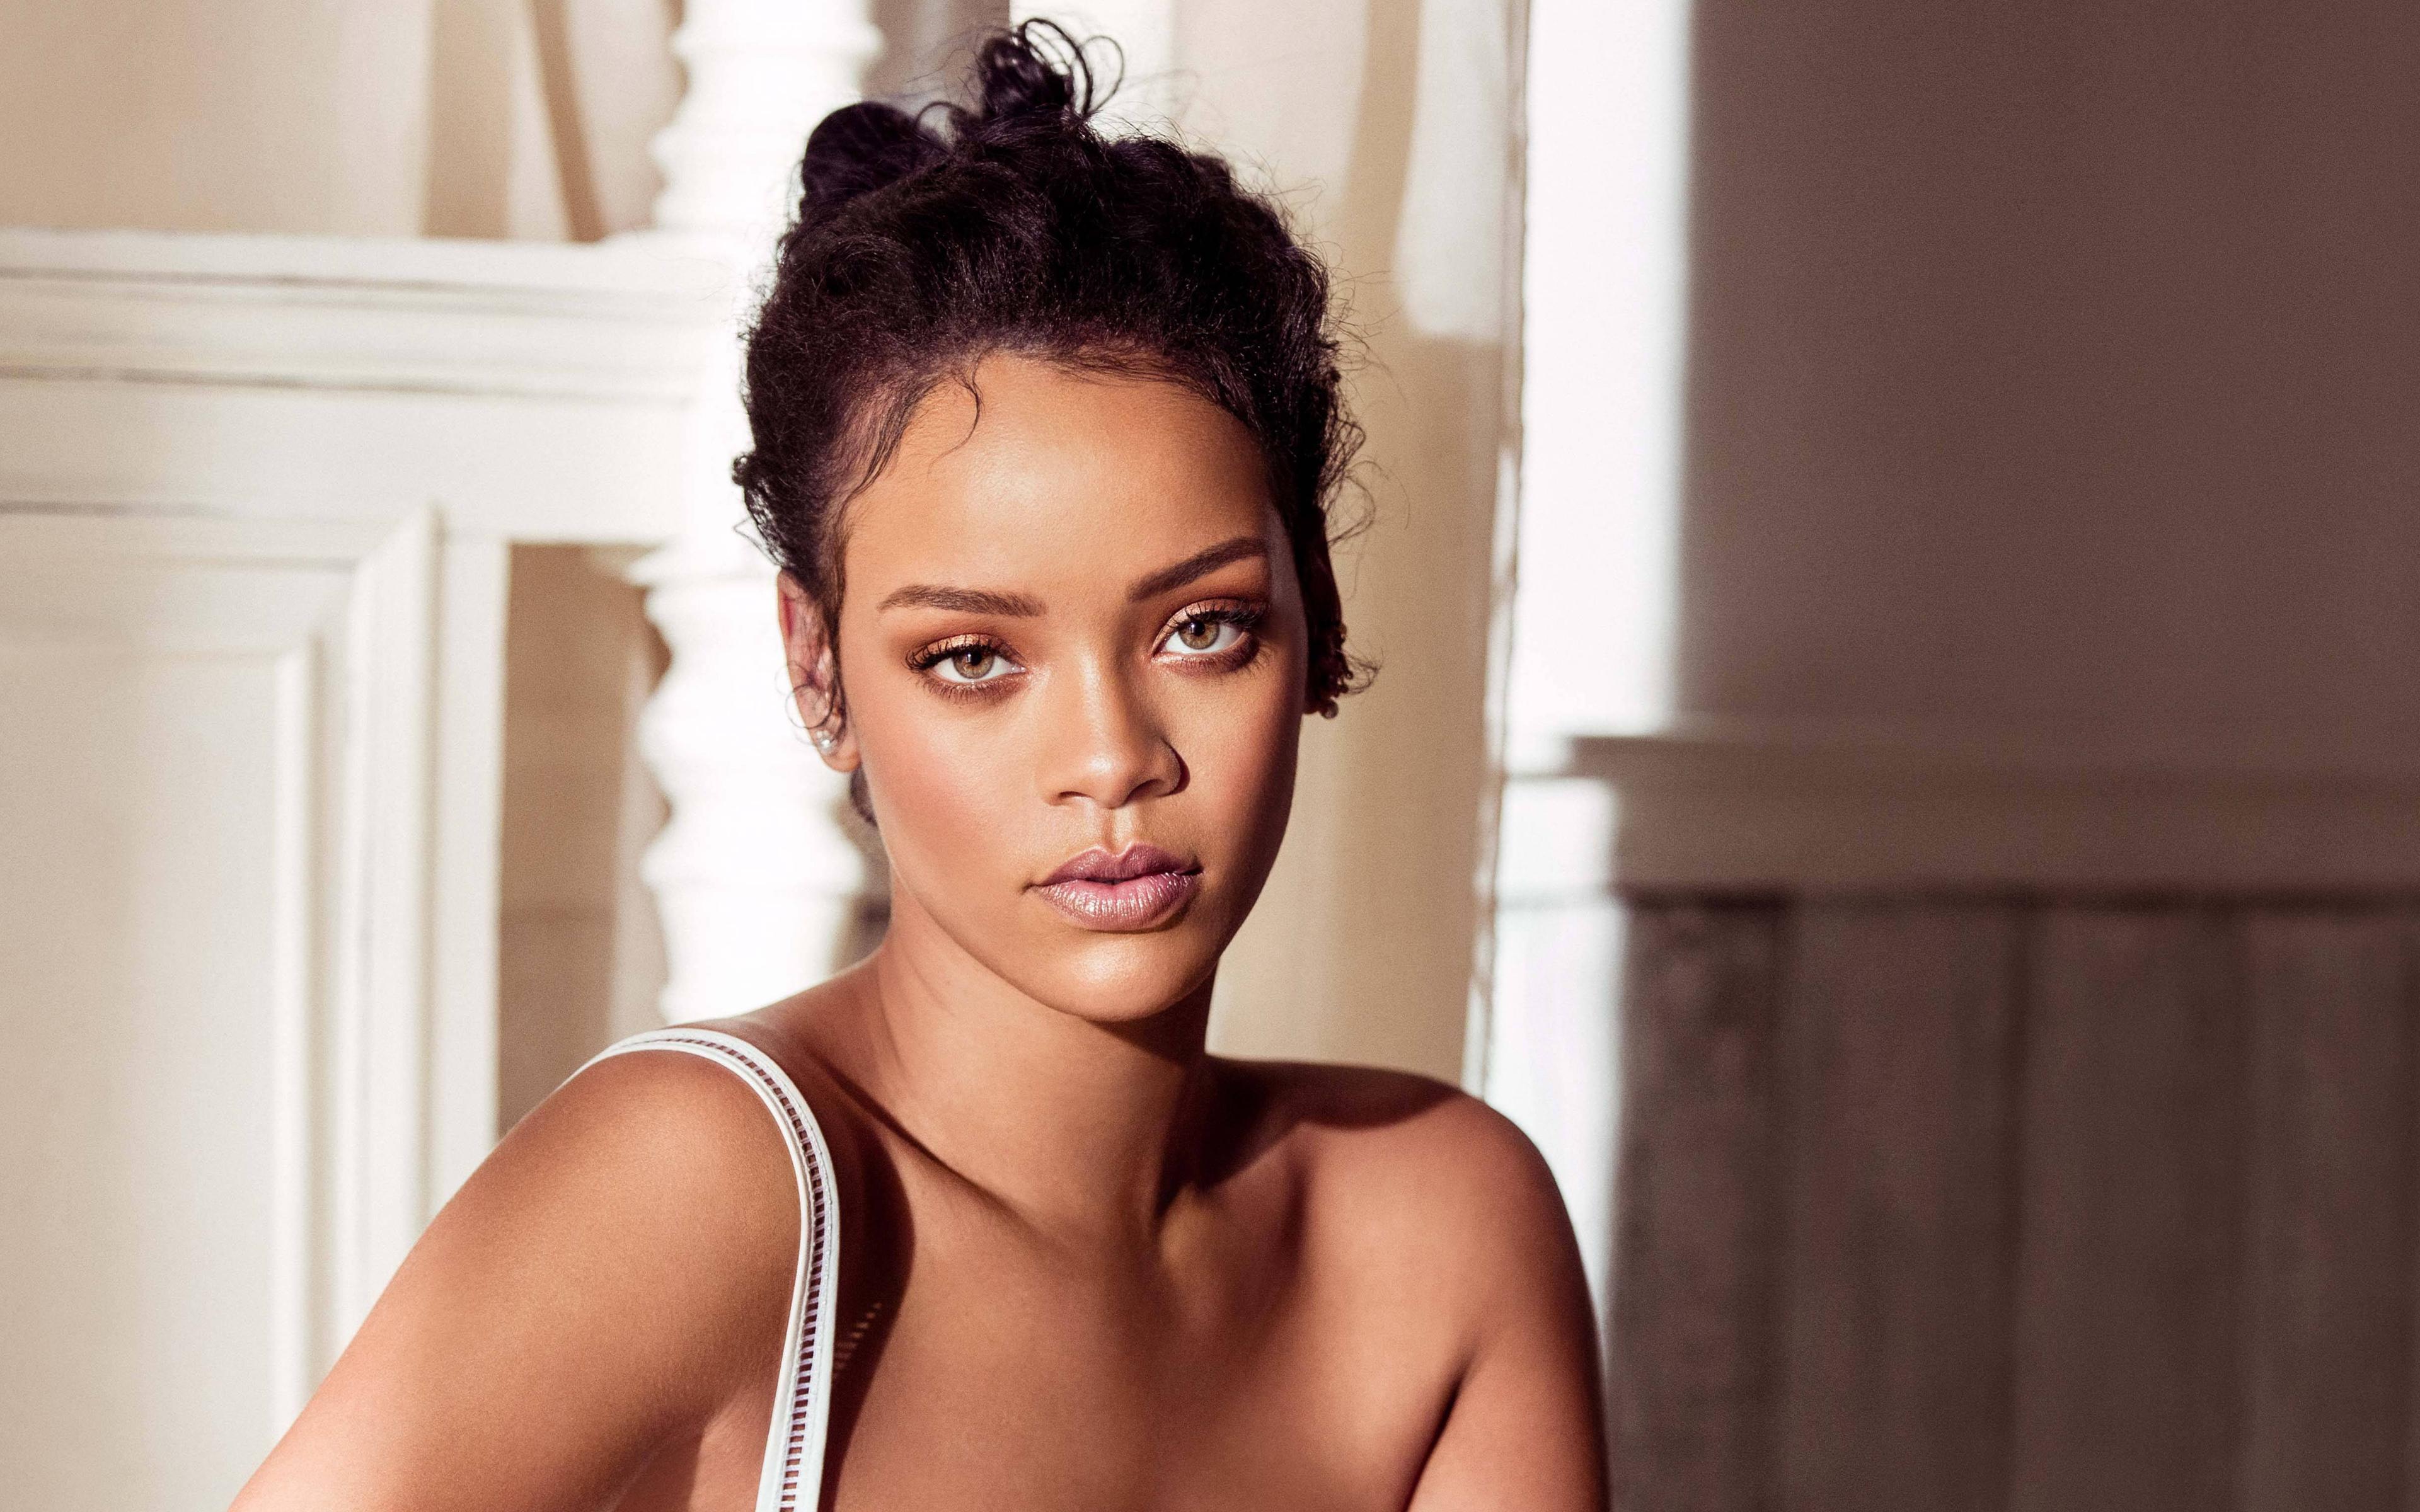 Rihanna nuovo album con i dj